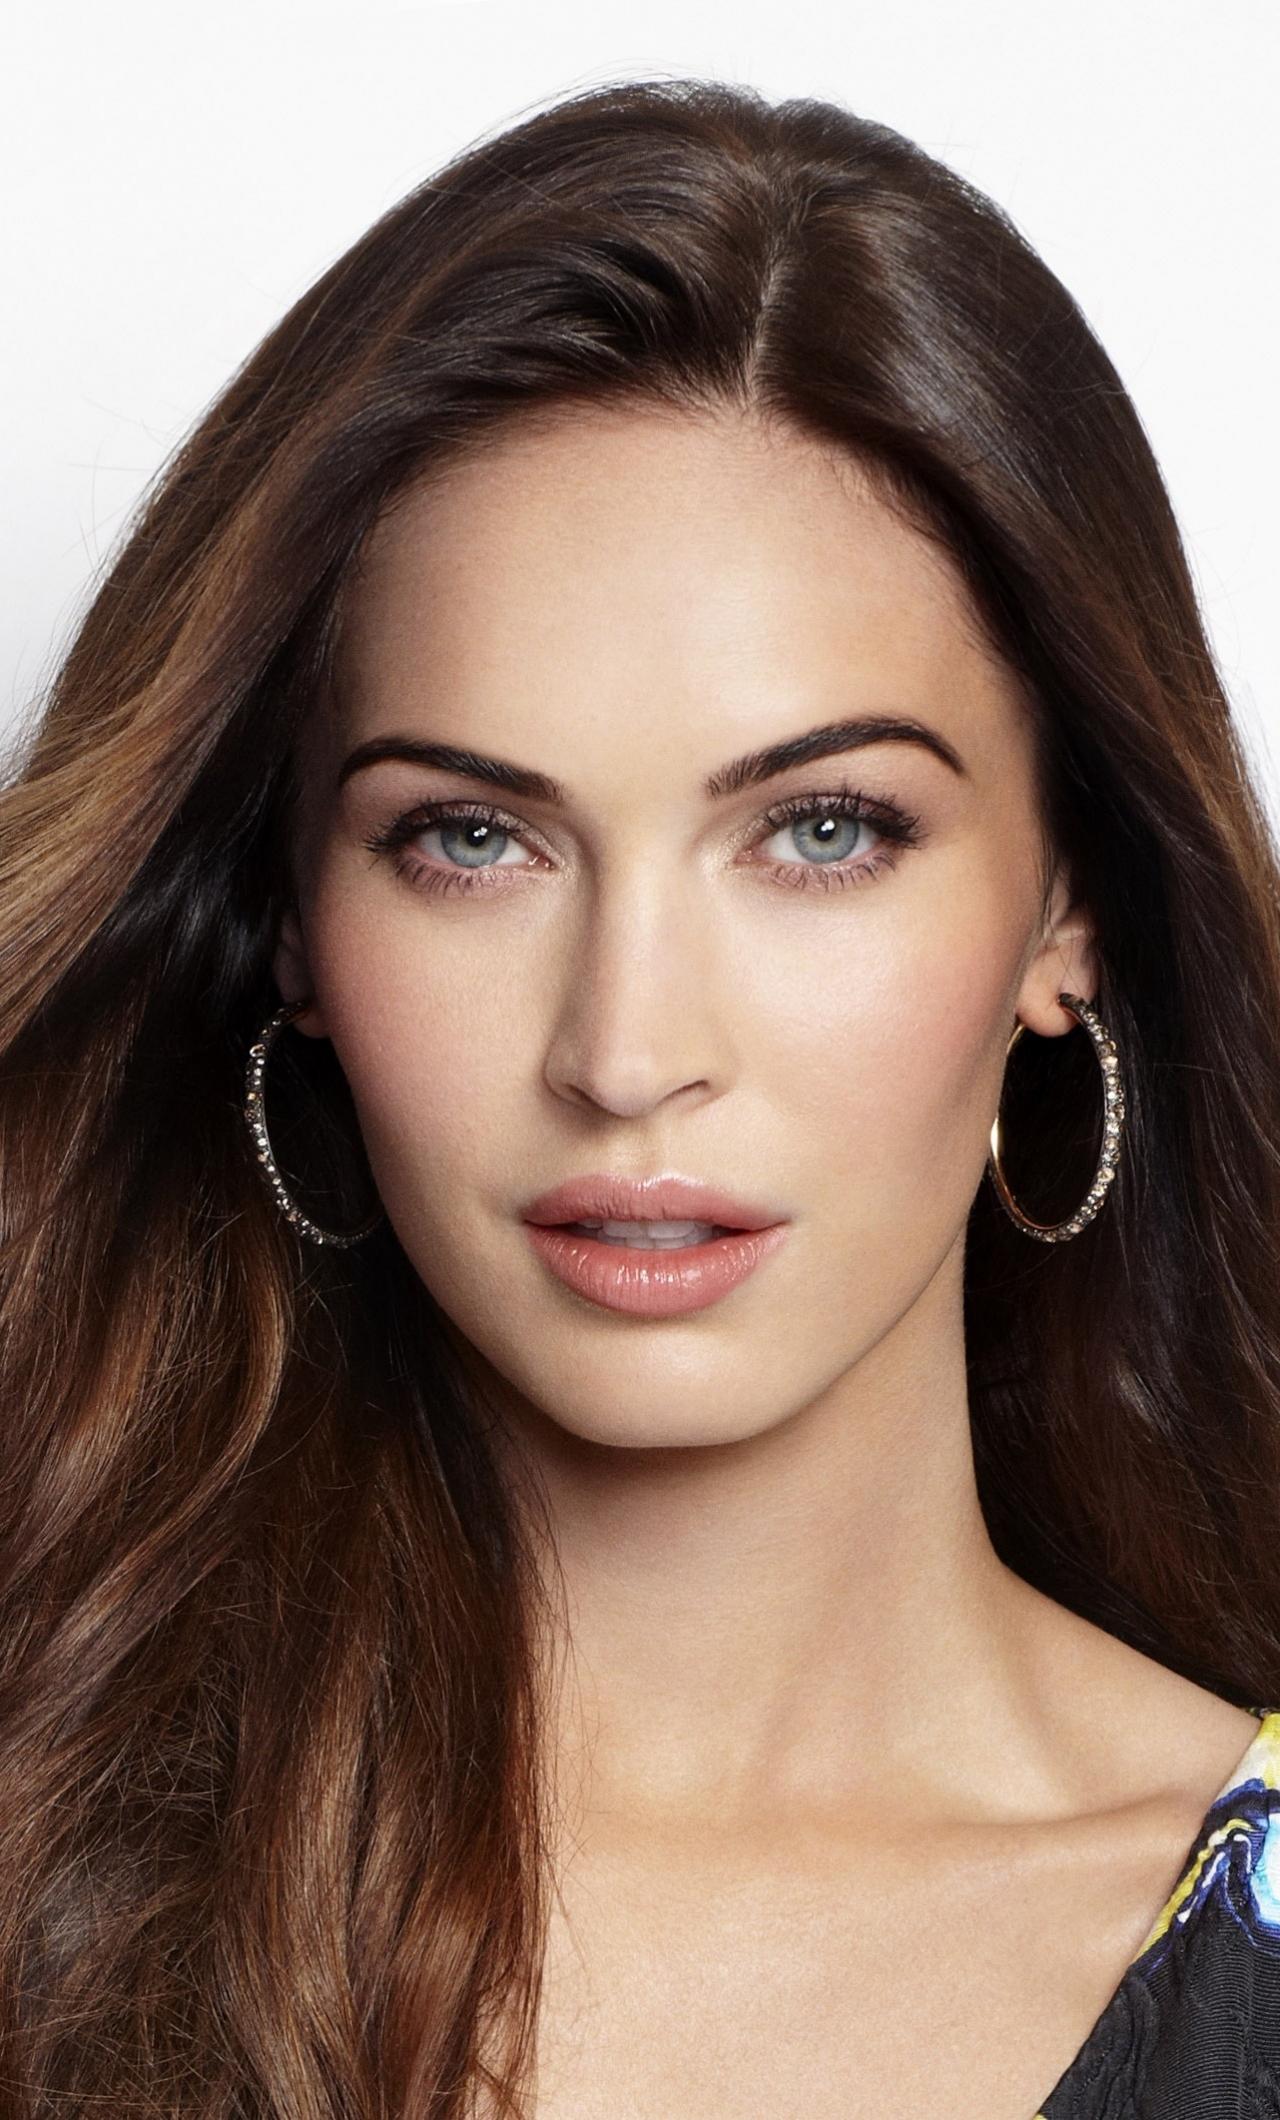 Download 1280x2120 Wallpaper Megan Fox Brunette Model